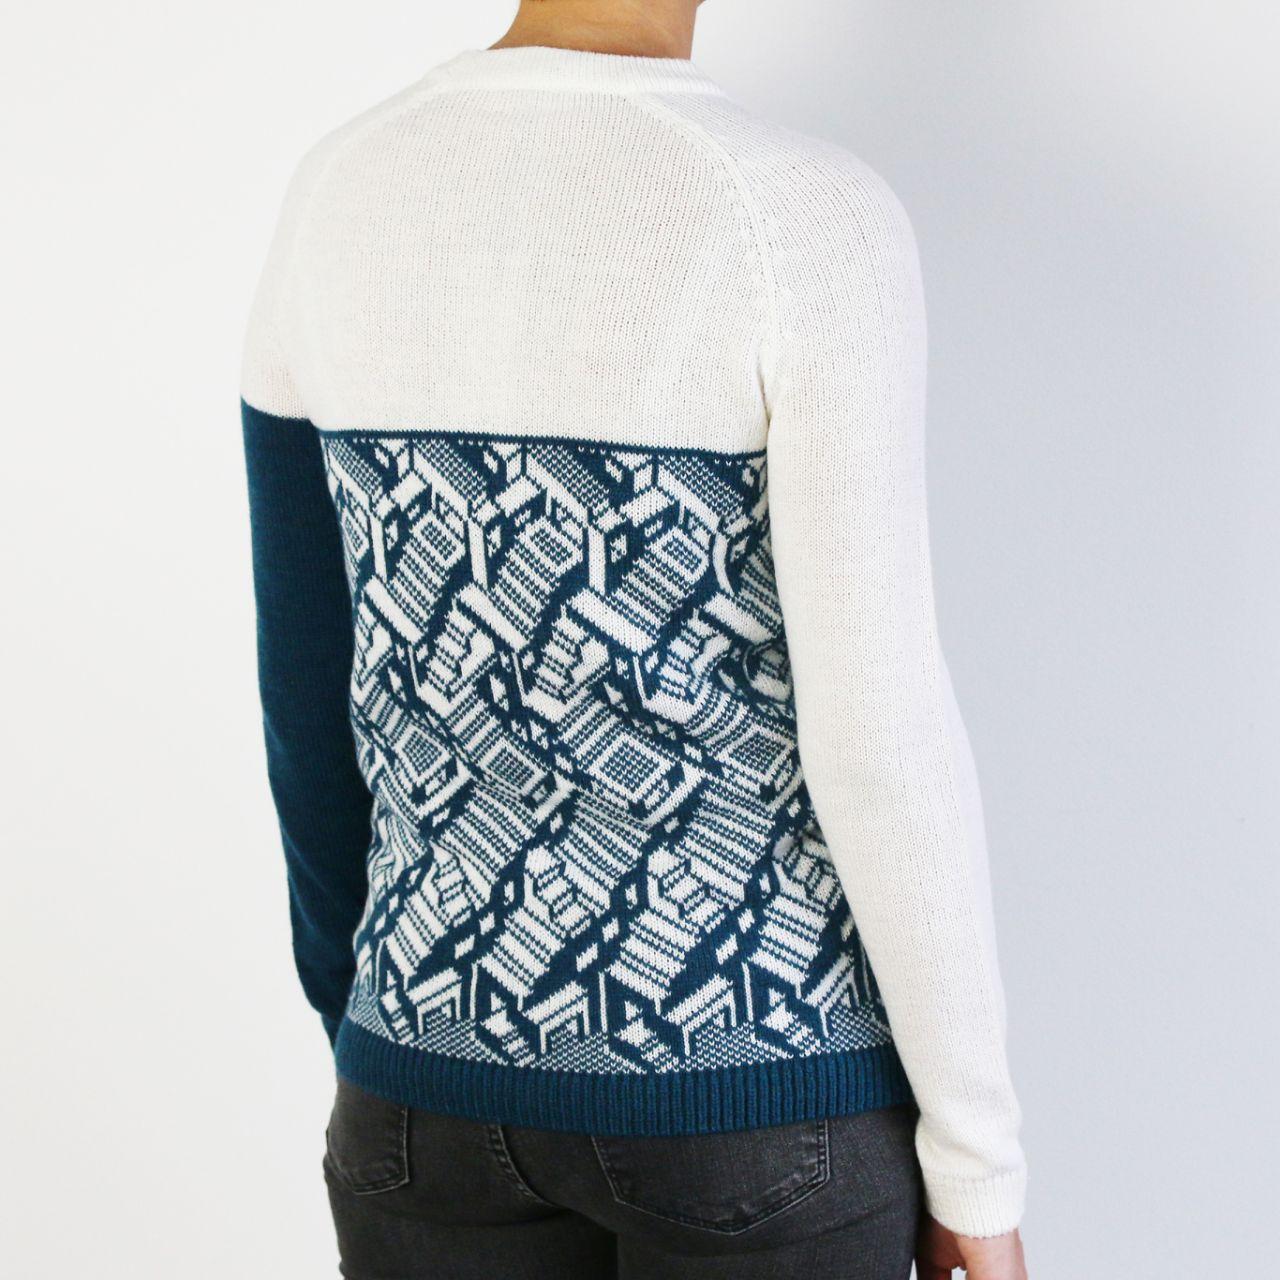 wool sweater mekoome no exit 6 2